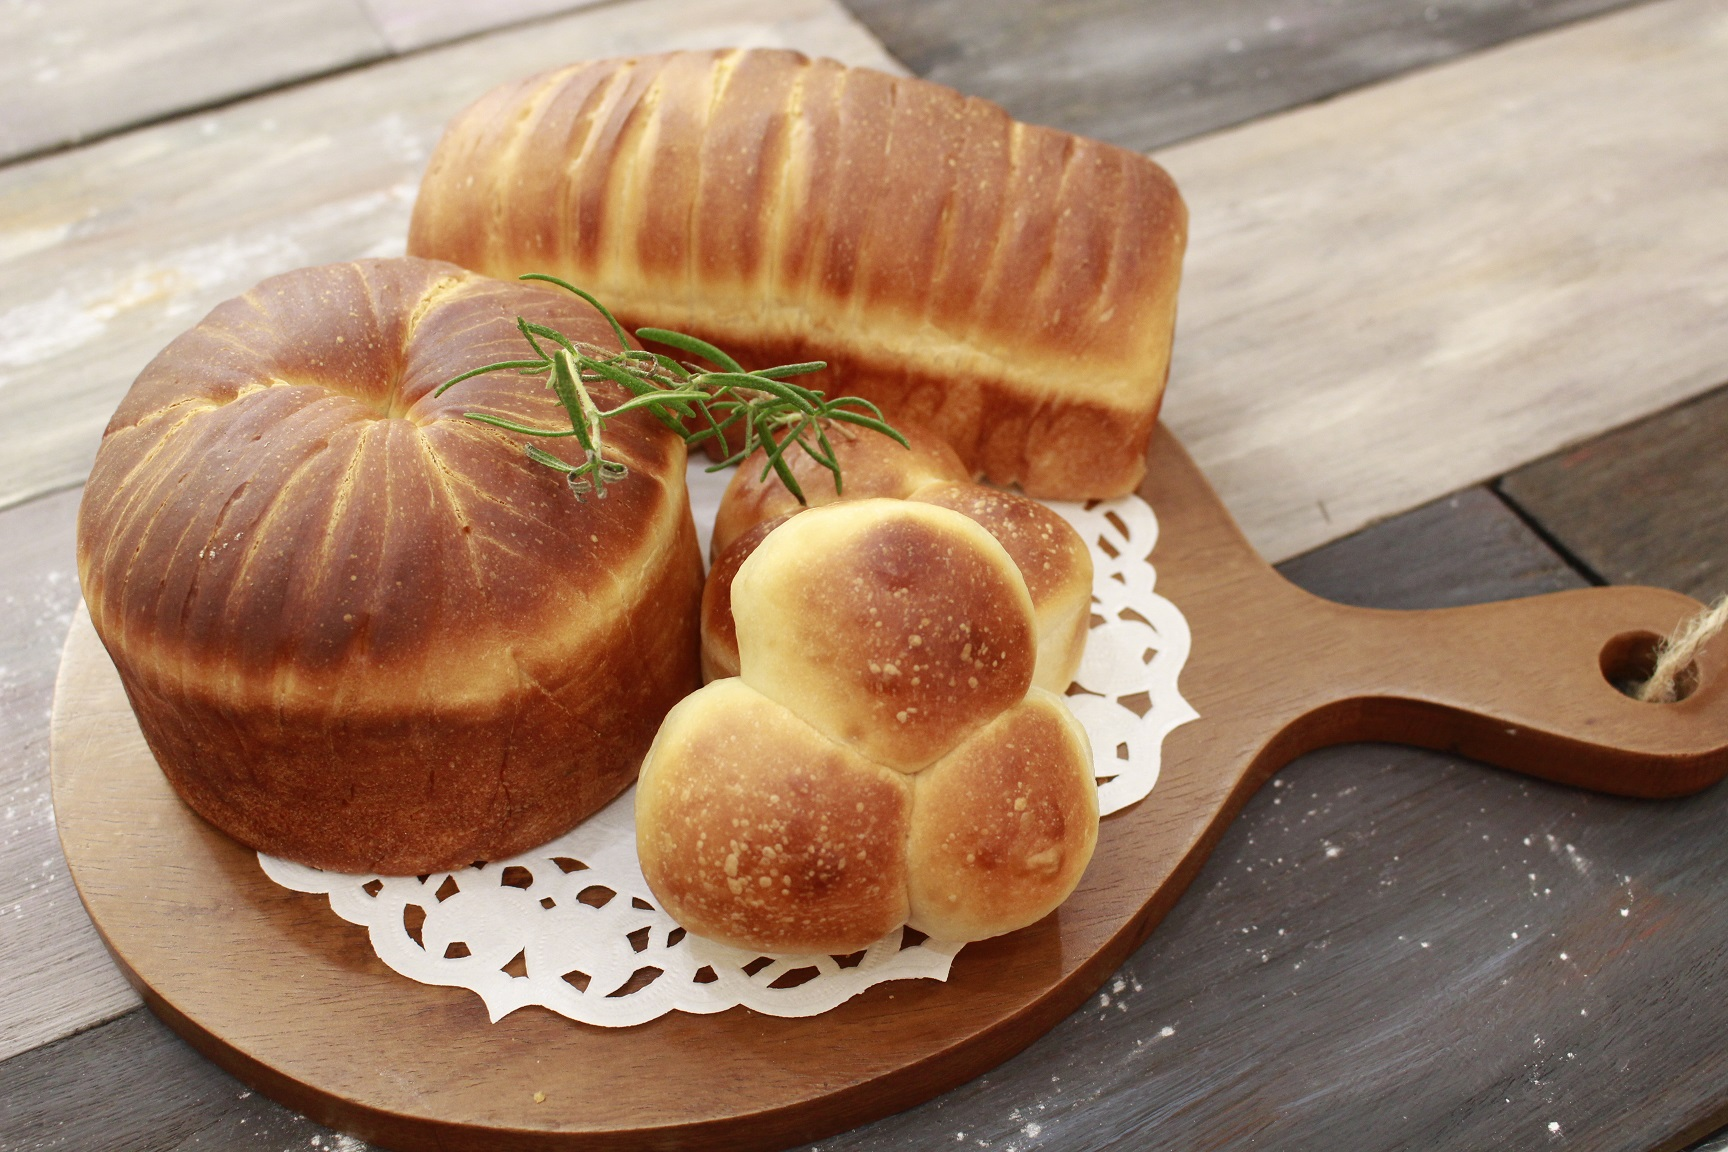 a-ta-sante糖質制限パン料理教室。阿倍野区。桃ヶ池町。a-ta-sant'e.スペルト小麦。ウールデコレーション。2021/10/15。低糖食コーディネーター。利野郁枝。